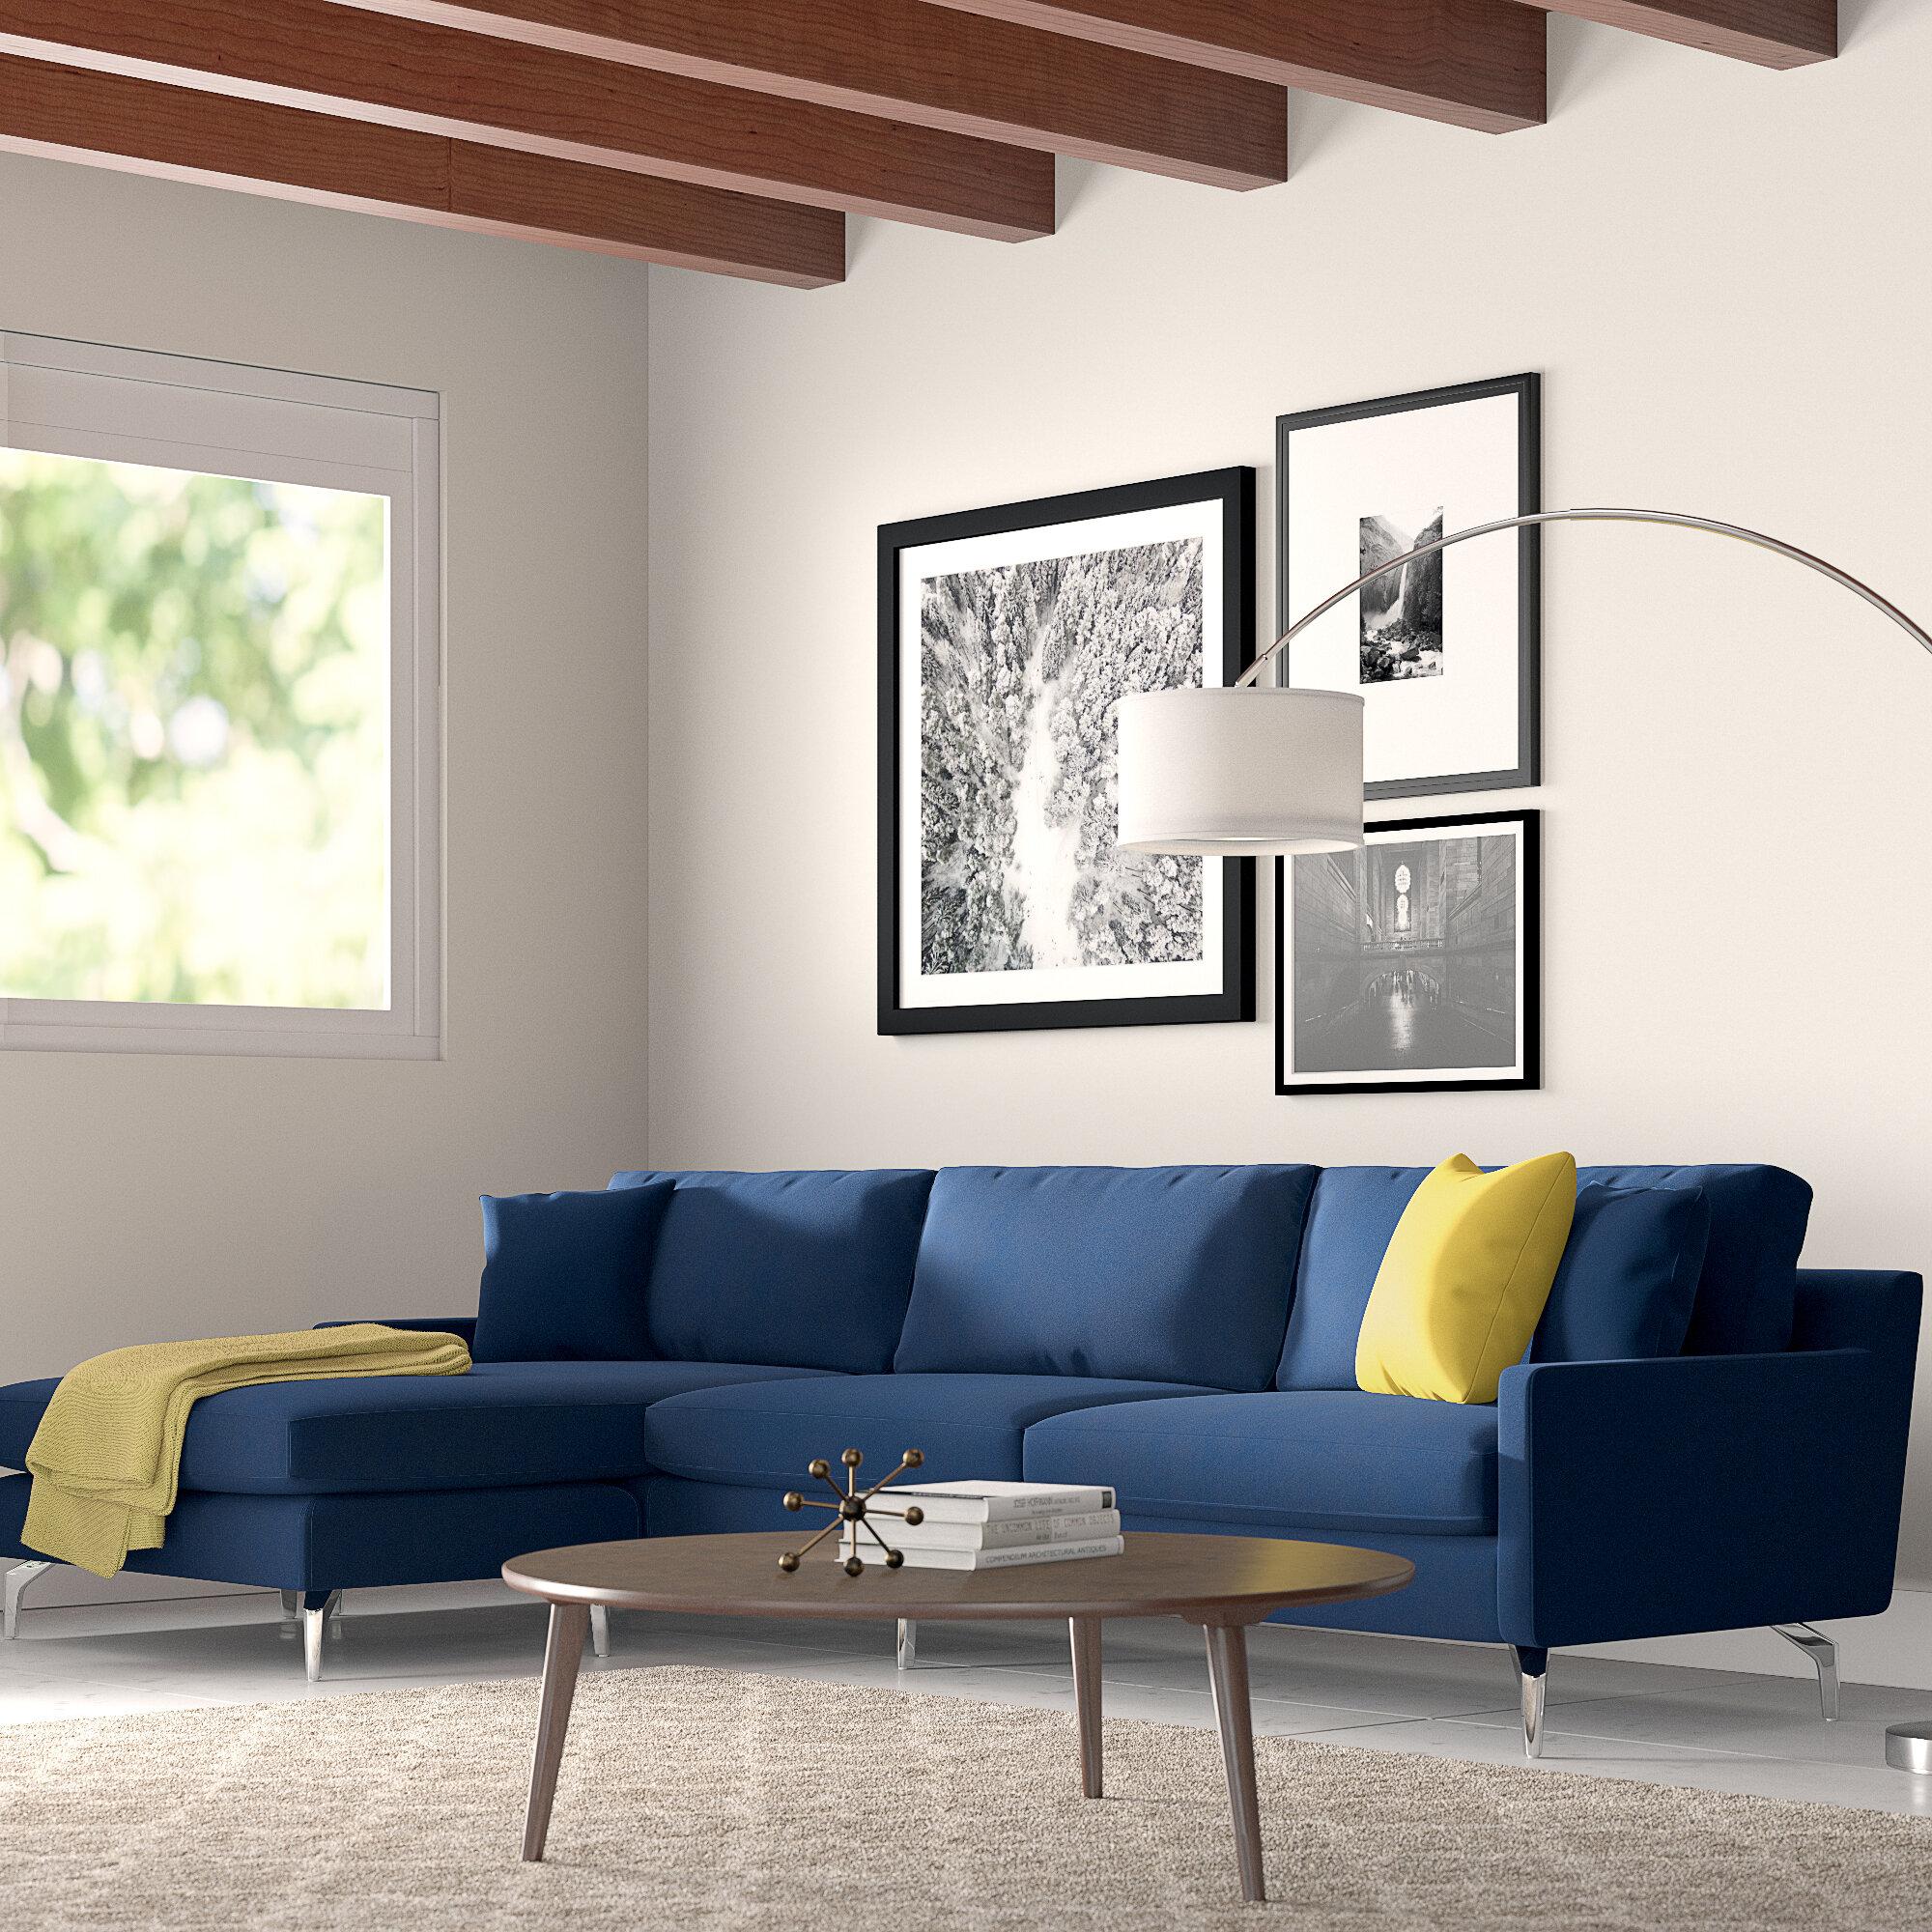 Admirable Clara Reversible Modular Sectional Creativecarmelina Interior Chair Design Creativecarmelinacom